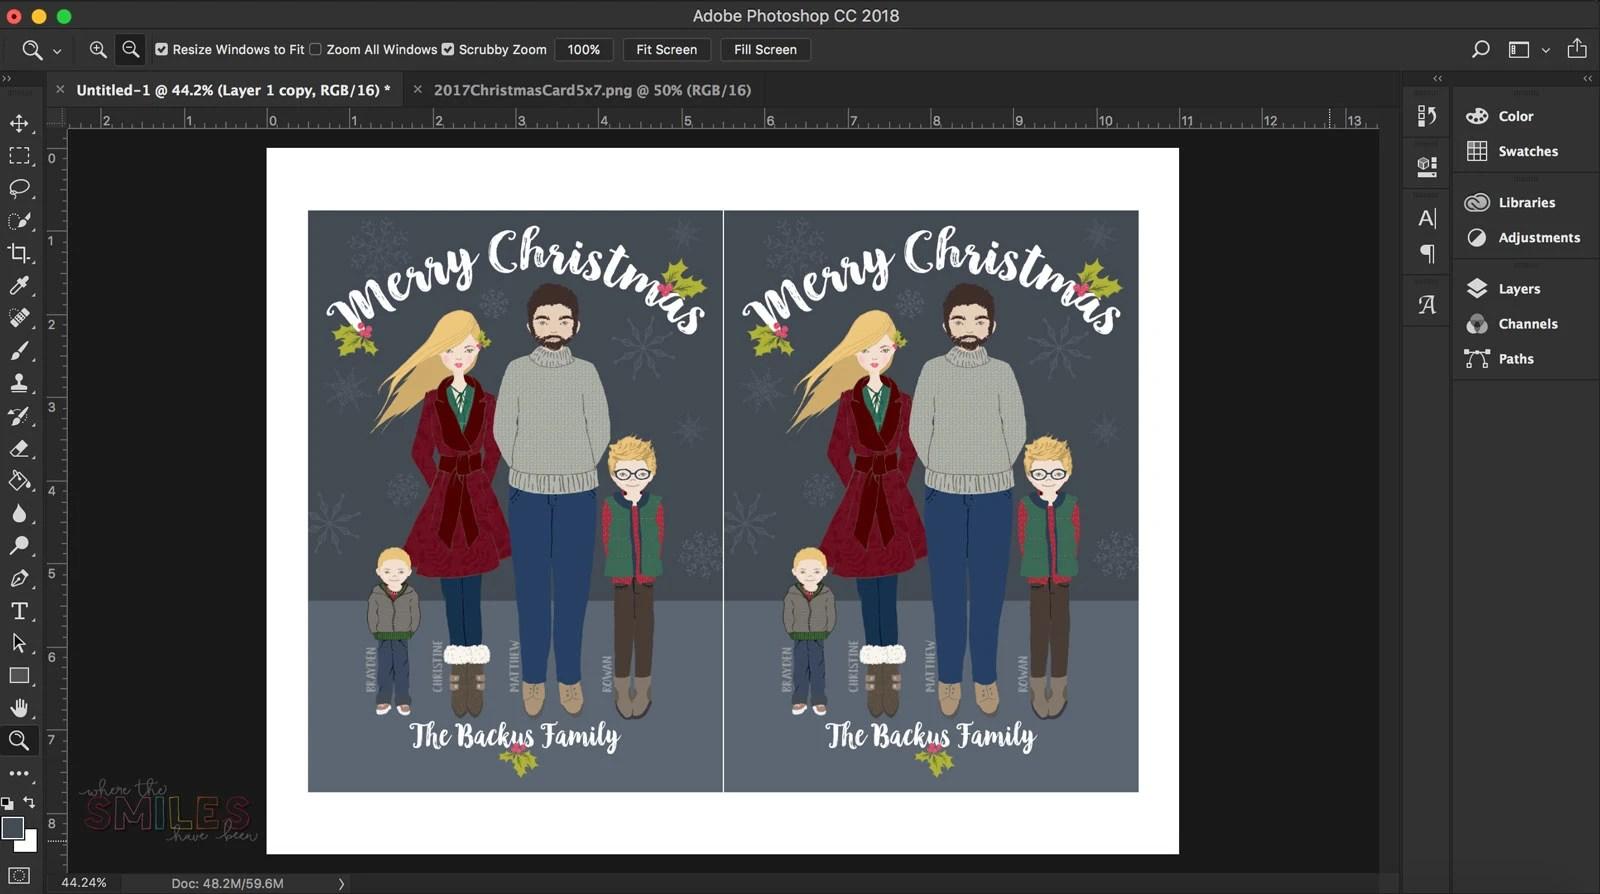 DIY Whimsical Family Portrait Christmas Card | Where The Smiles Have Been #Christmas #card #portrait